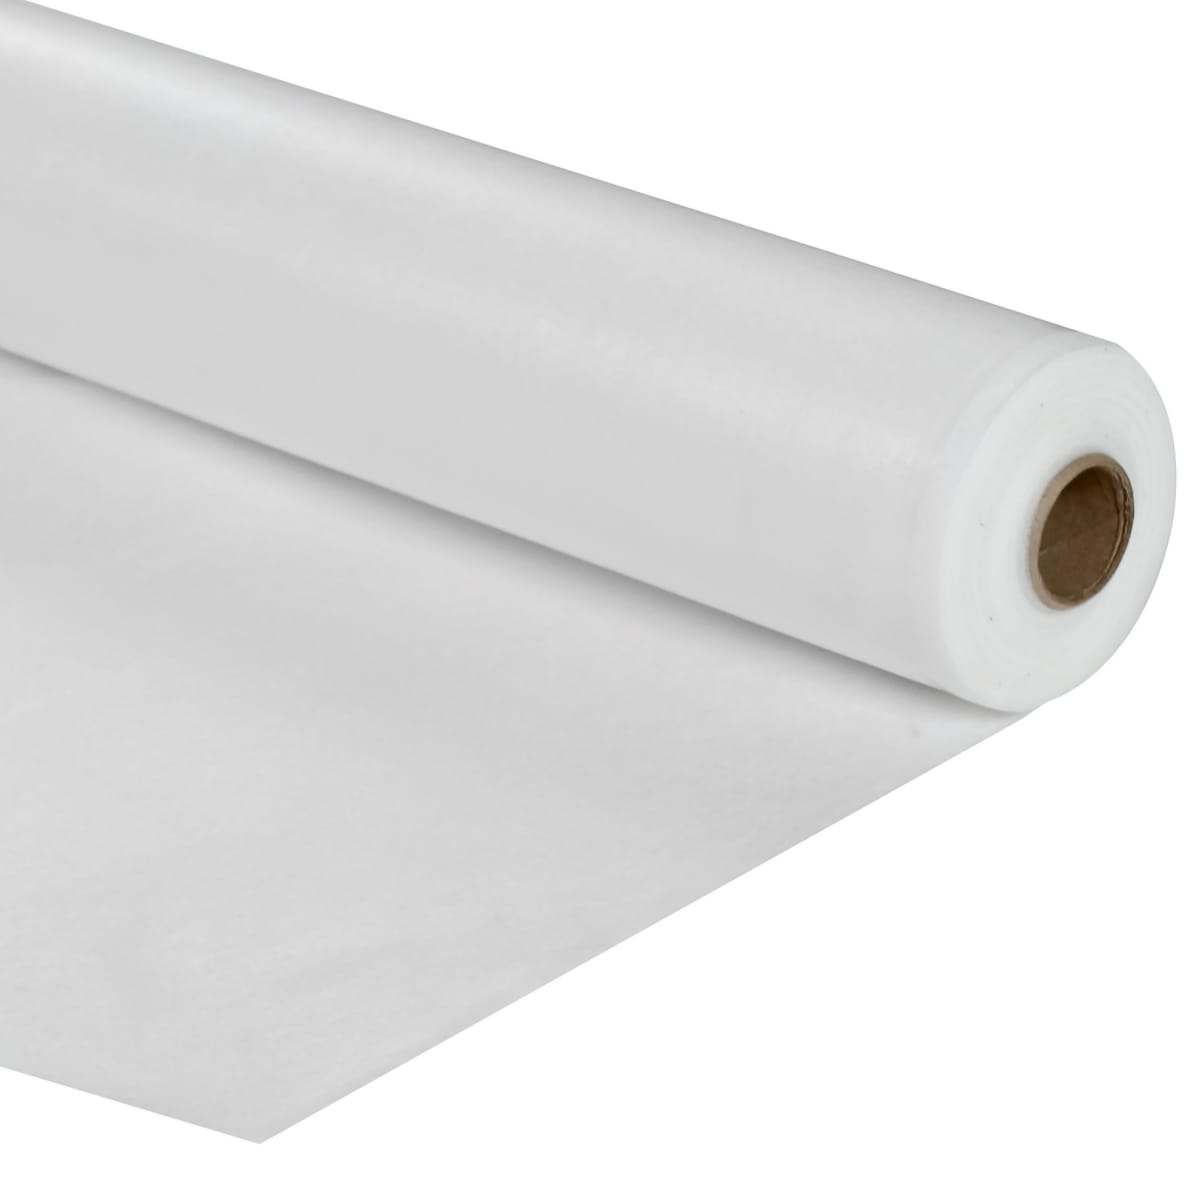 Юниспан A Гидро-ветрозащитная паропроницаемая пленка (70м2)